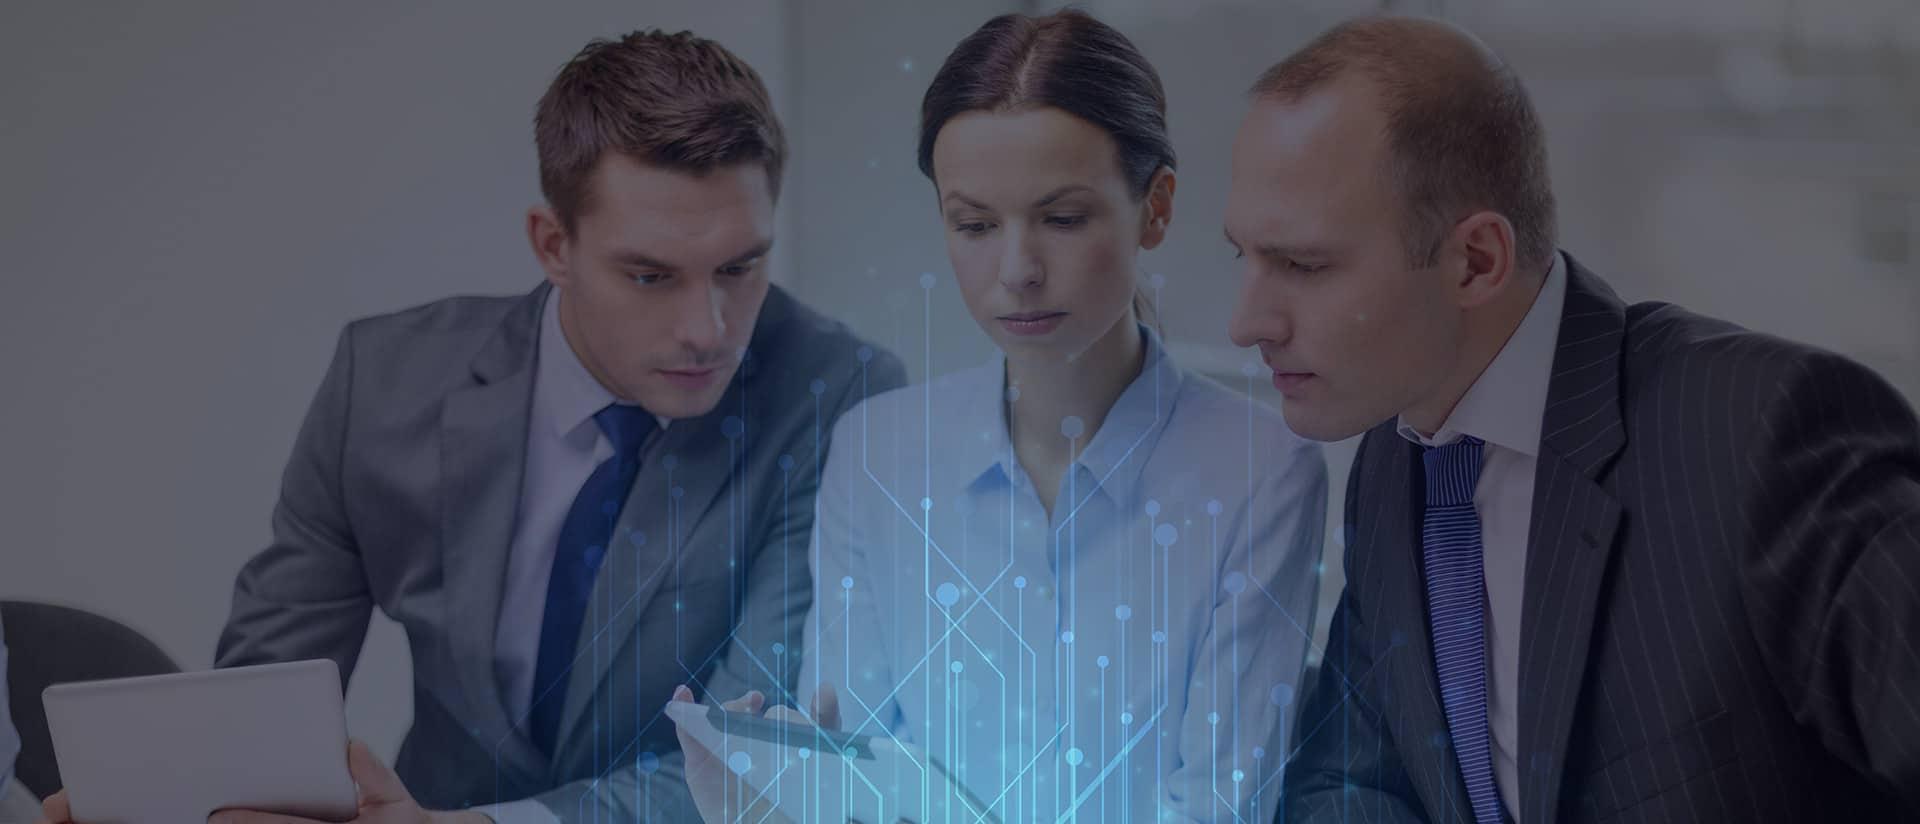 Cybervisor® Cyber Security Representation - Virtual CISO Services